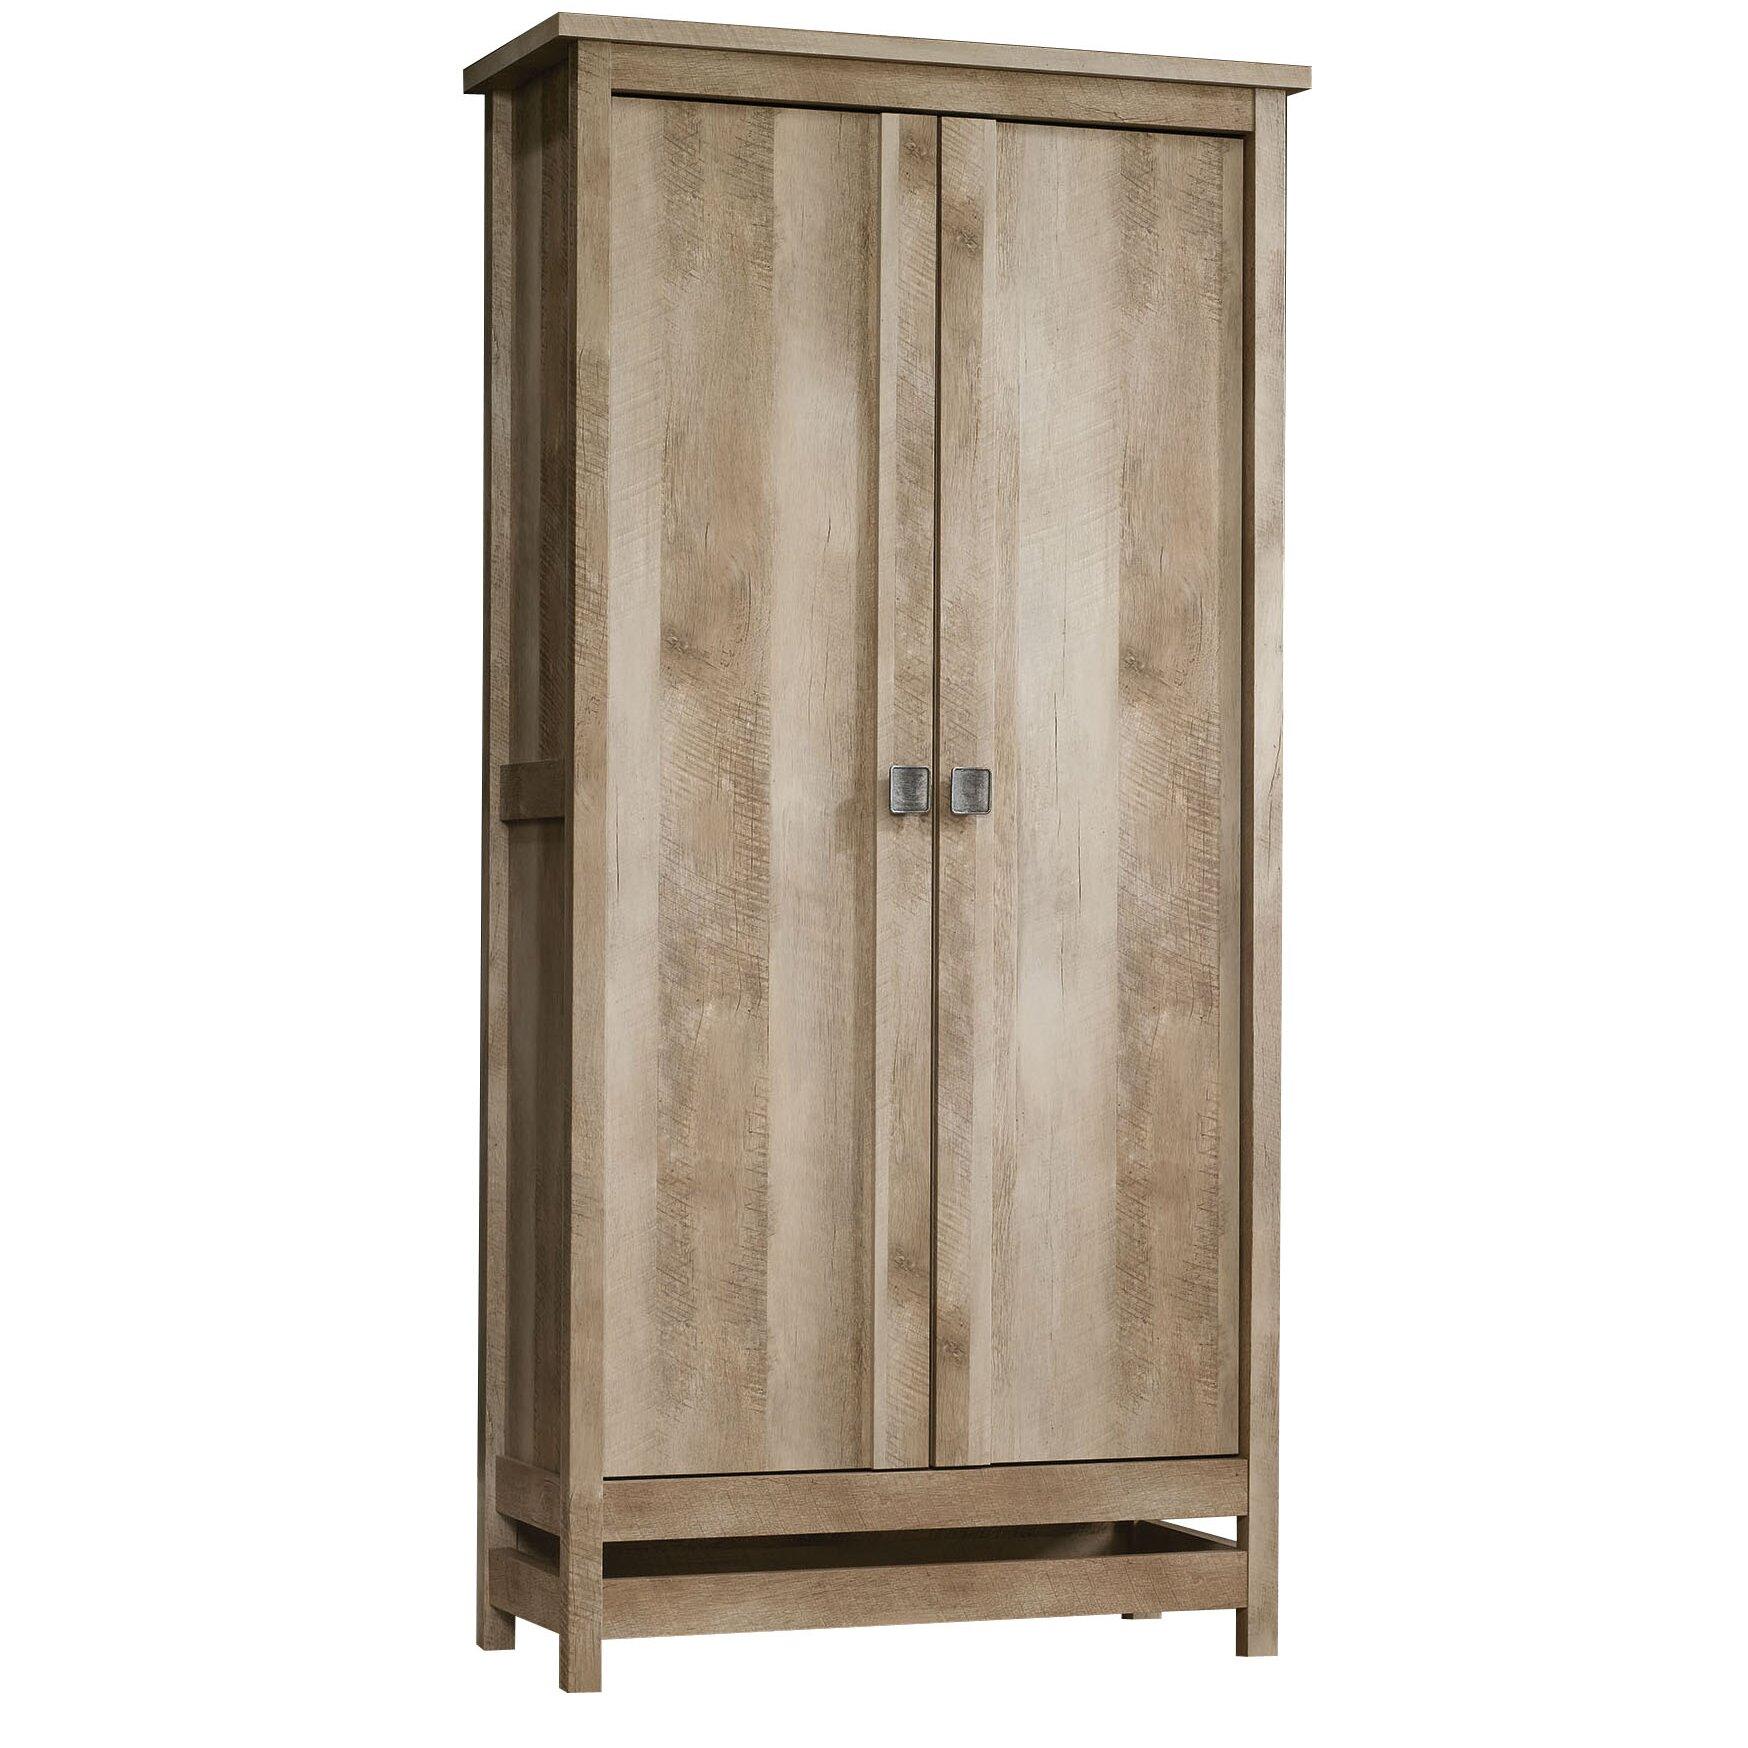 ... Sauder Pantry Cabinet With Sauder Cannery Bridge Door Storage Cabinet  Uamp Reviews Wayfair With Oak Pantry